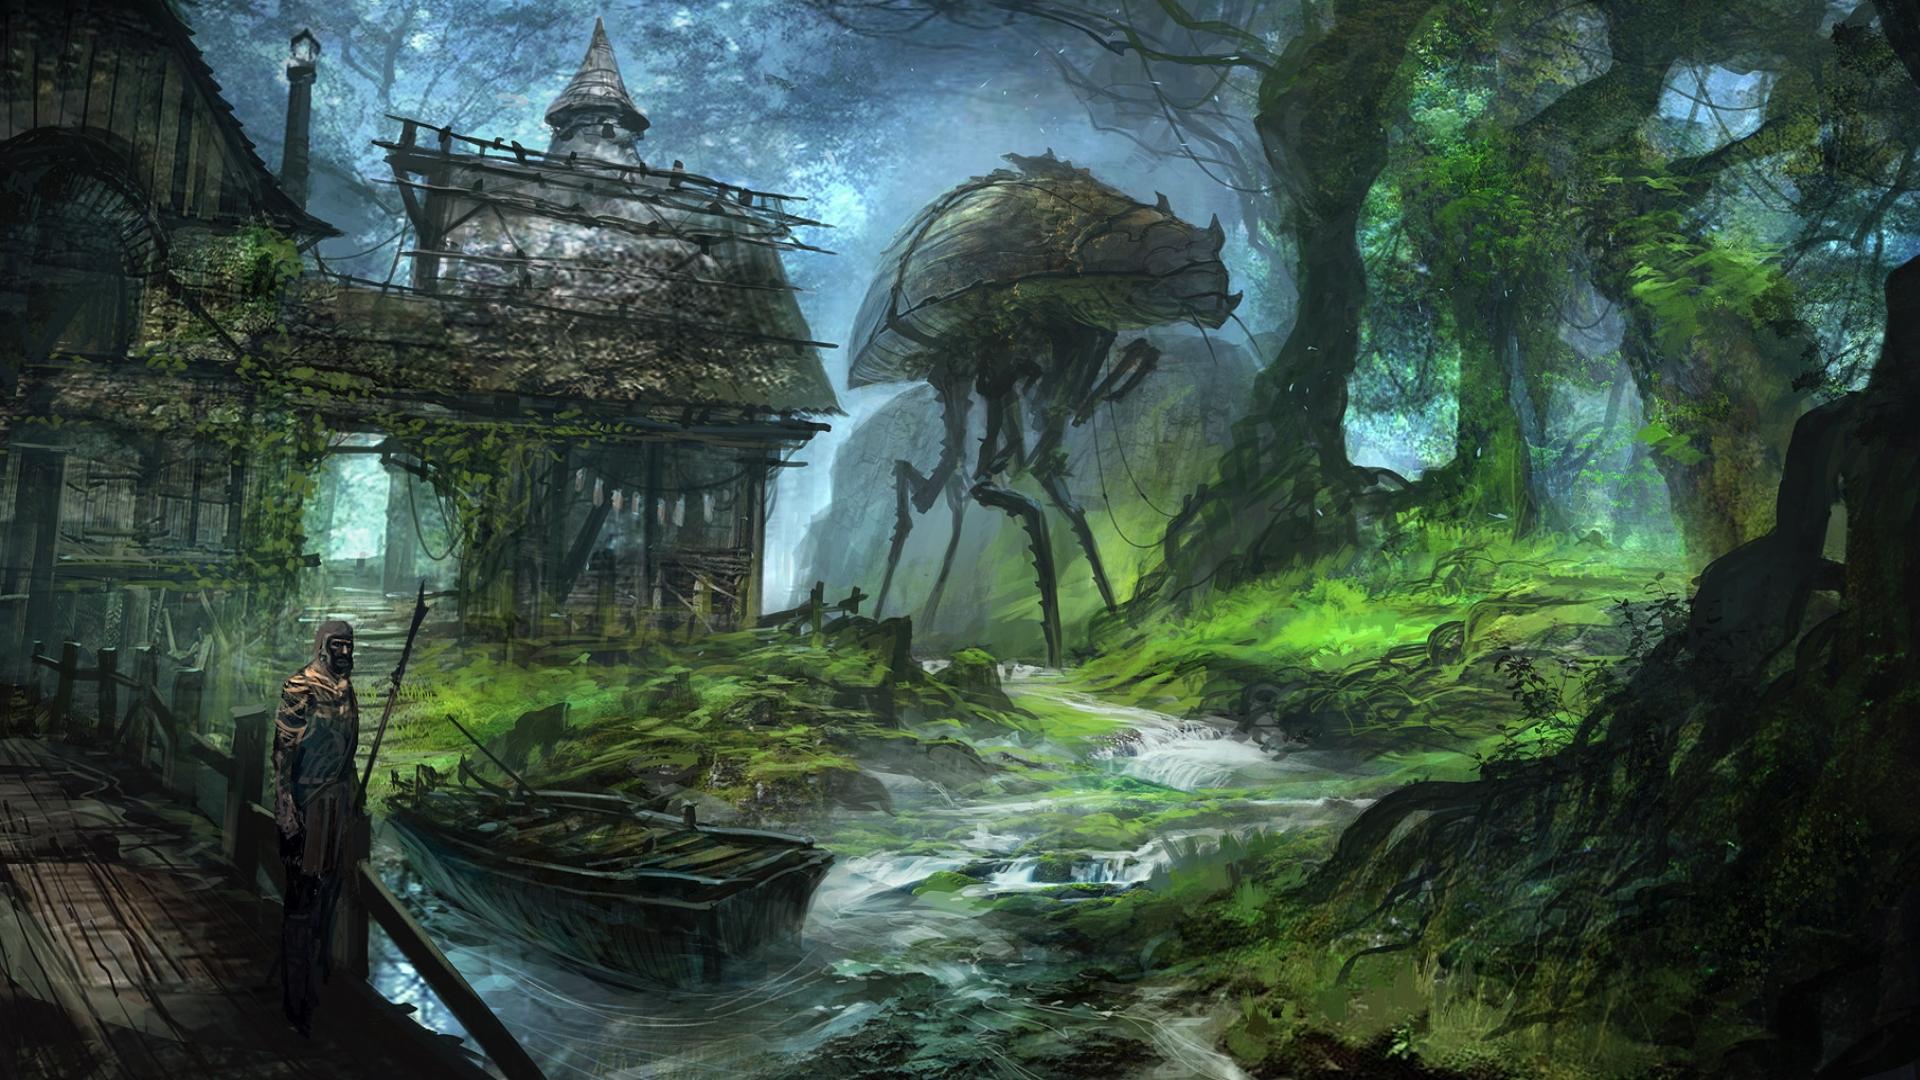 1505138568404.jpg - Elder Scrolls 3: Morrowind, the